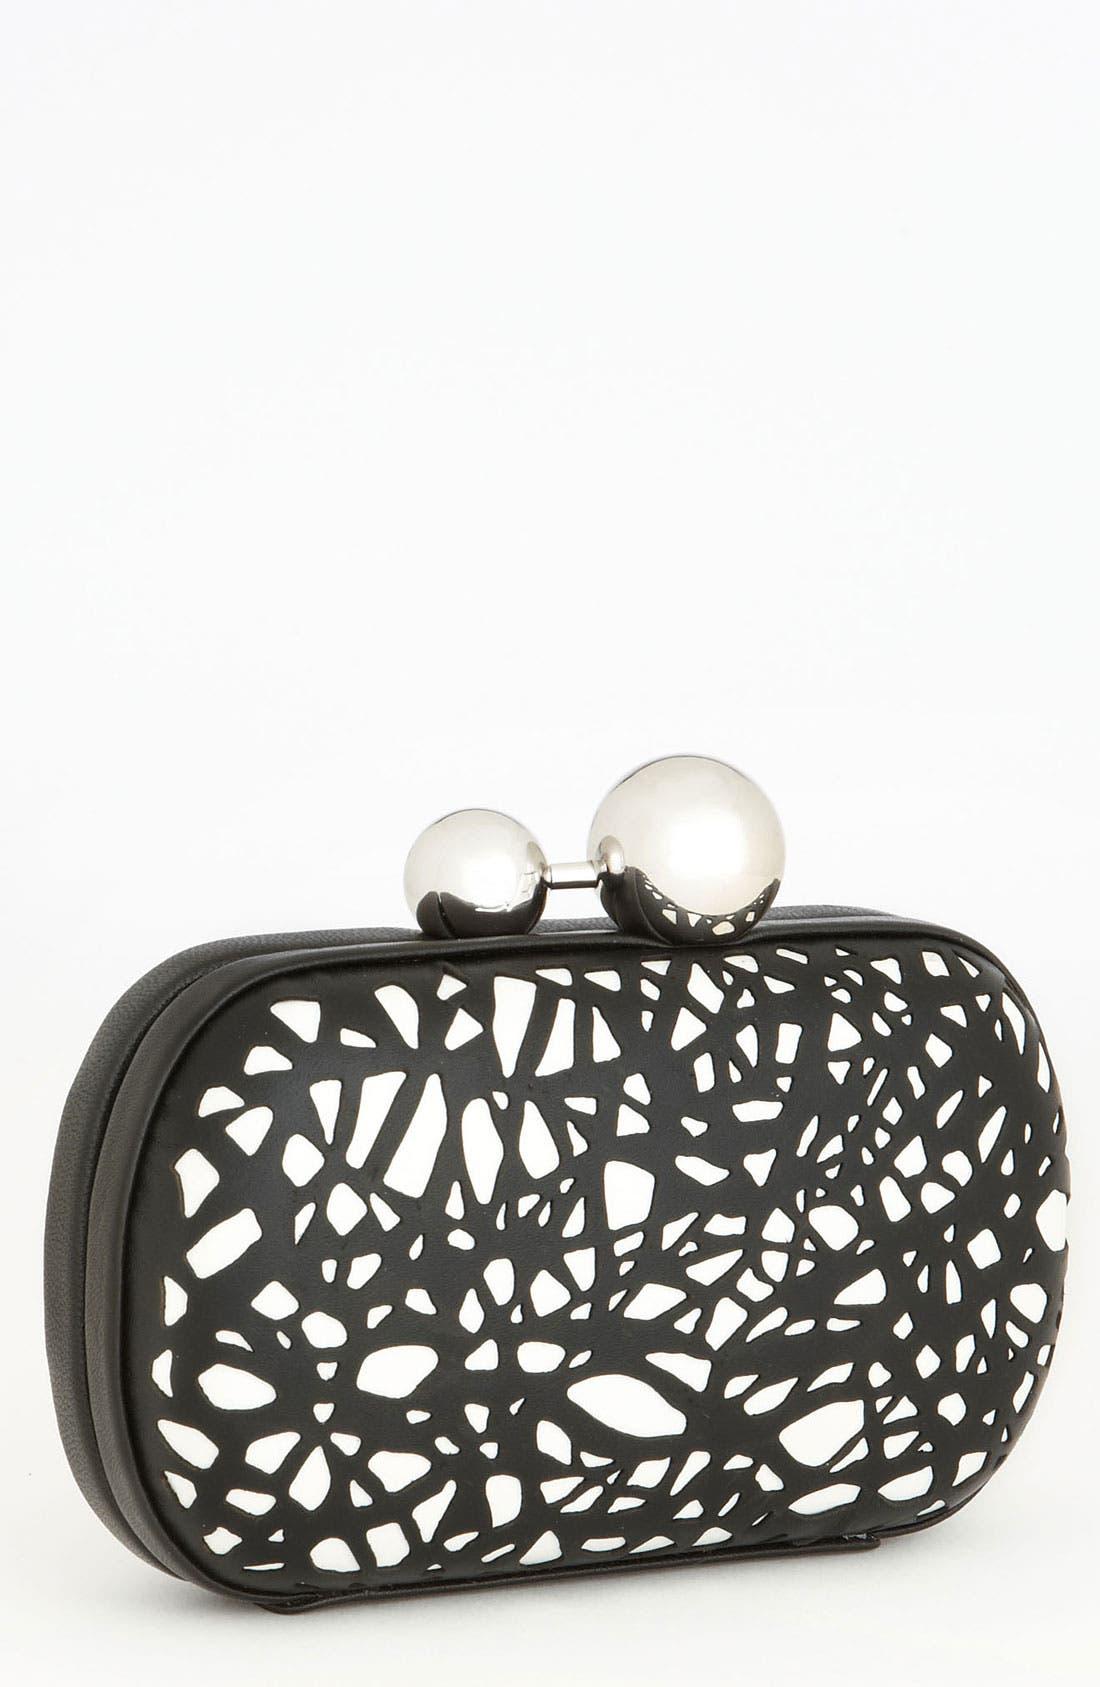 Alternate Image 1 Selected - Diane von Furstenberg 'Sphere' Laser Cut Leather Clutch